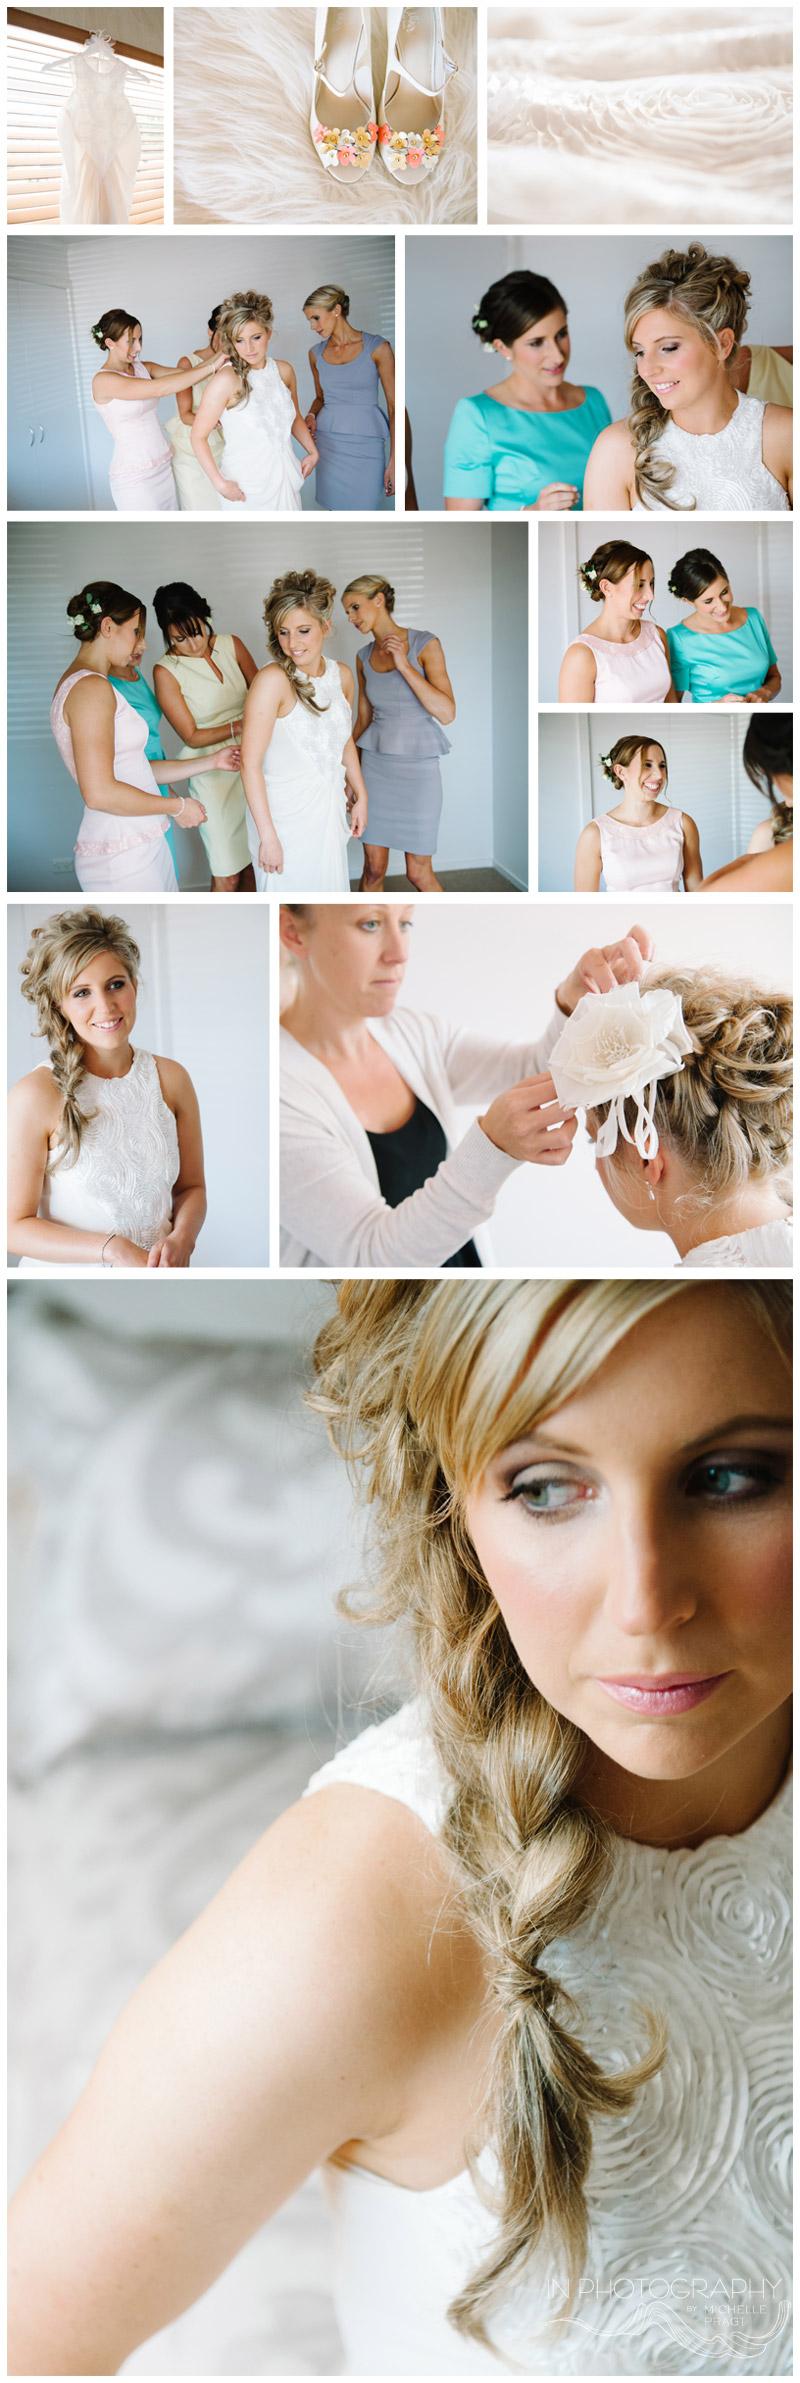 bride with fish tail plait